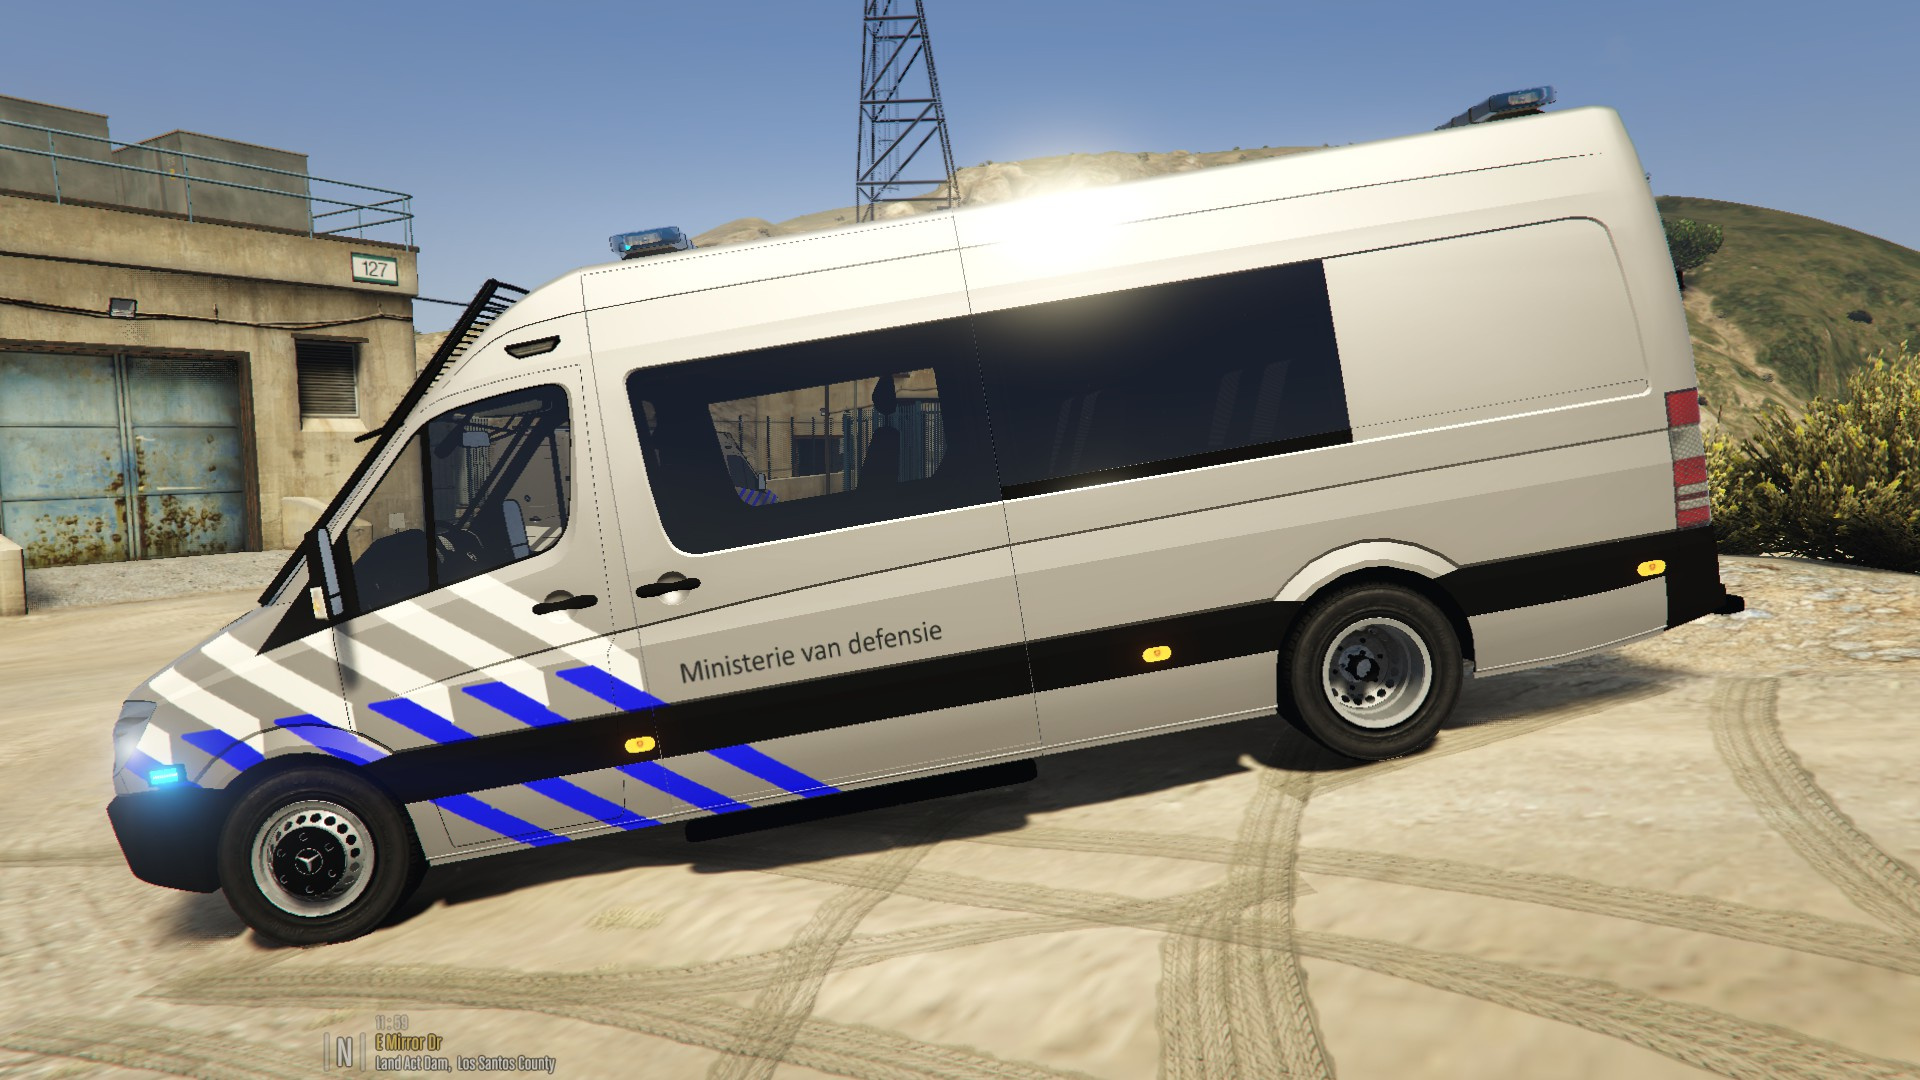 Bmw Sprinter Van >> Mercedes Sprinter Ministerie van defensie [ELS] - GTA5-Mods.com